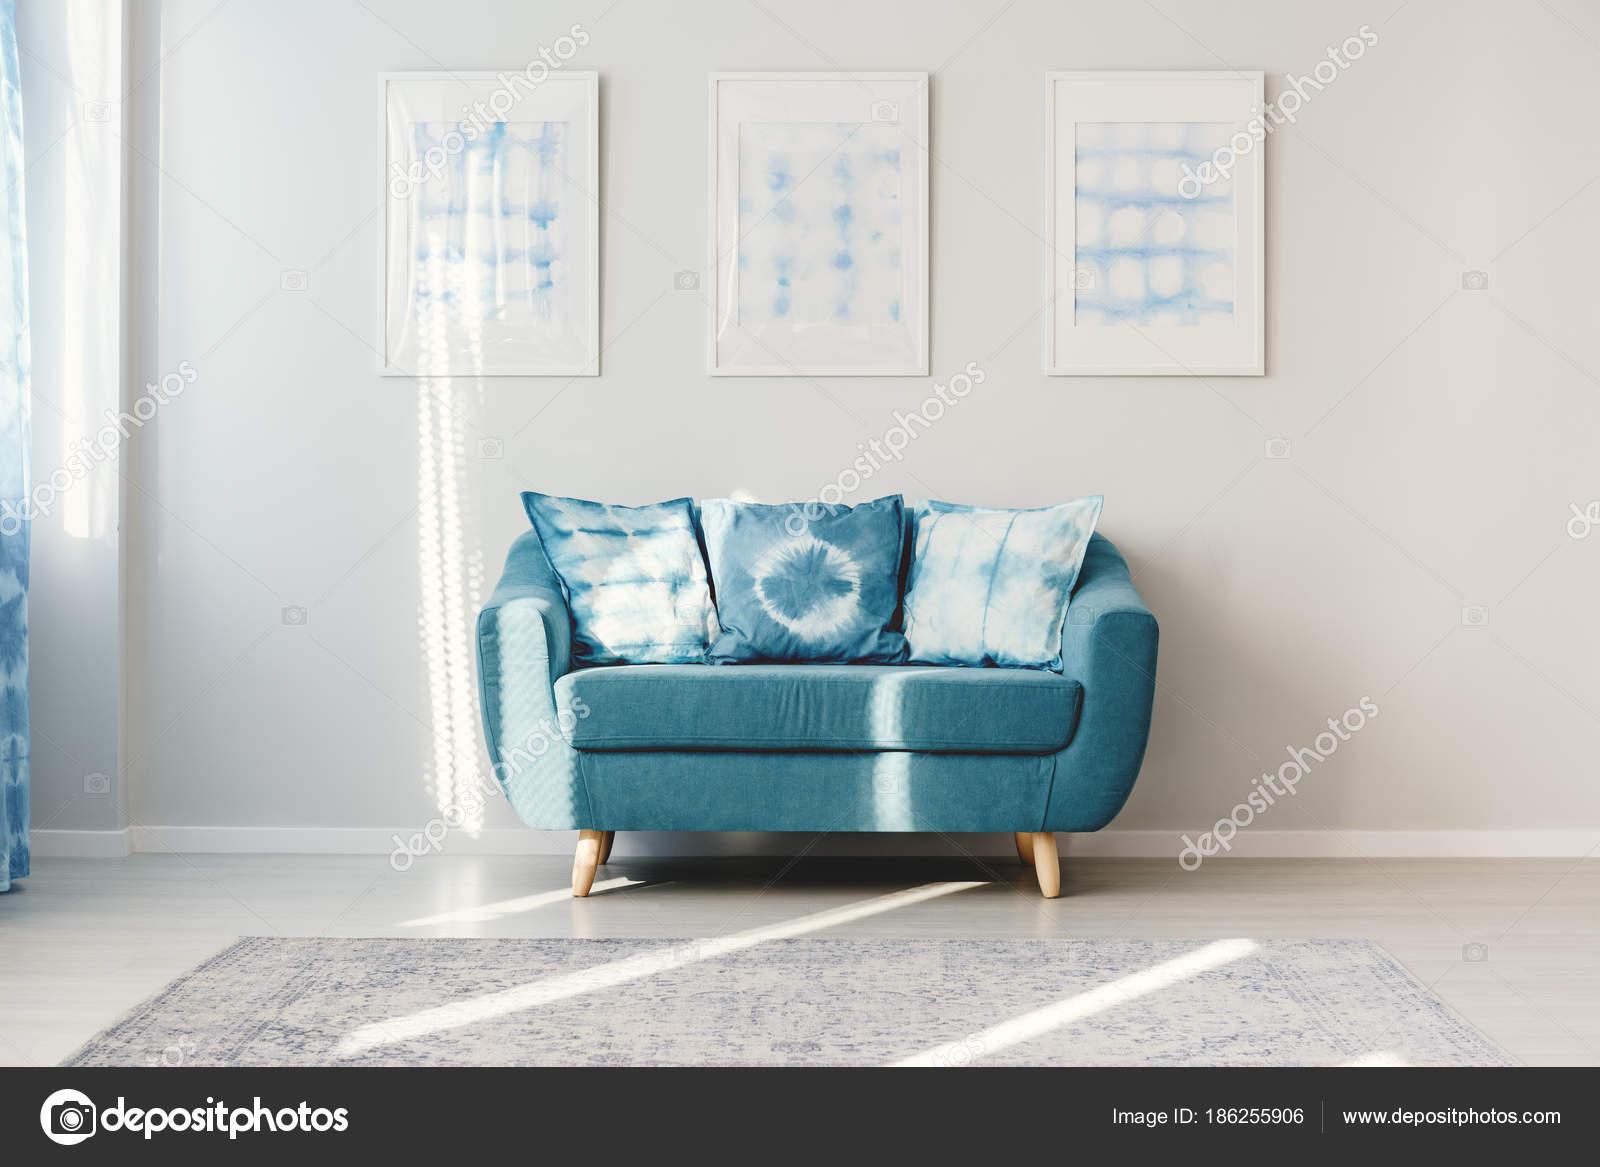 Turquoise Accessoires Woonkamer : Turquoise woonkamer met posters u2014 stockfoto © photographee.eu #186255906